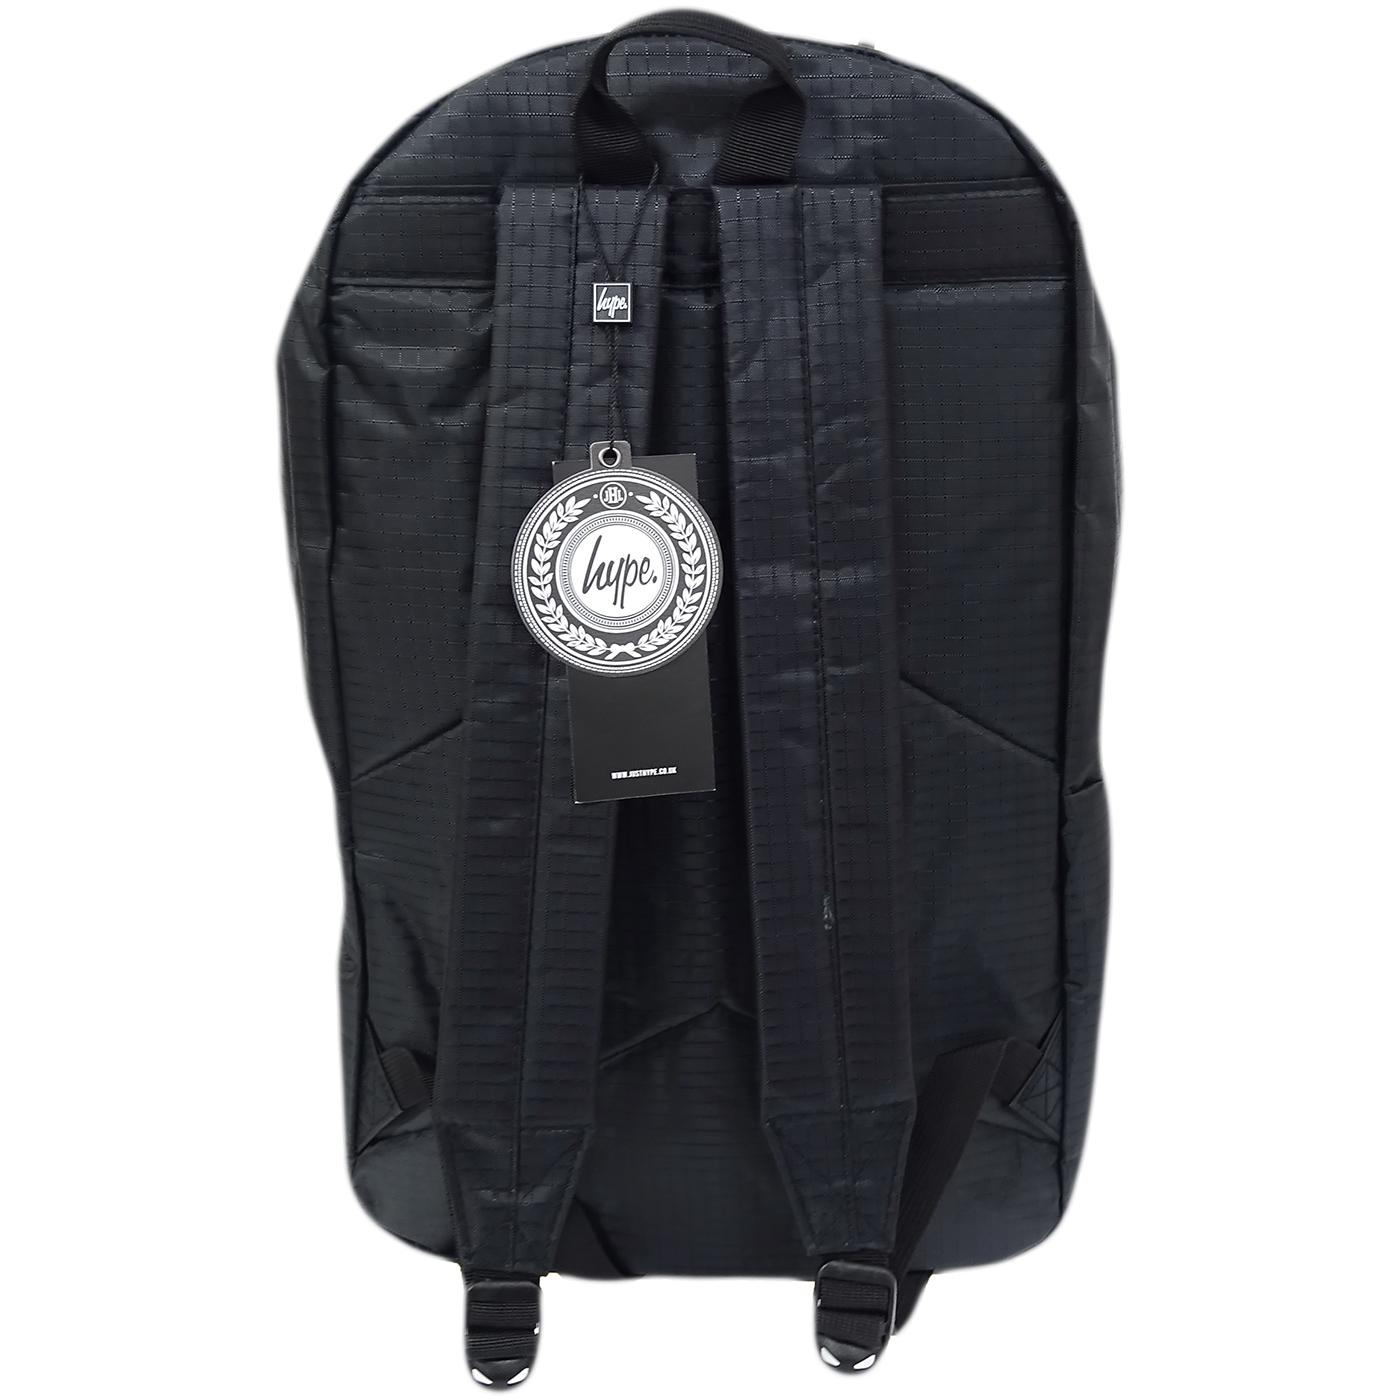 Unisexe-Hype-Sac-A-Dos-Ecole-Gym-SACS-pochettes-pencil-case miniature 166